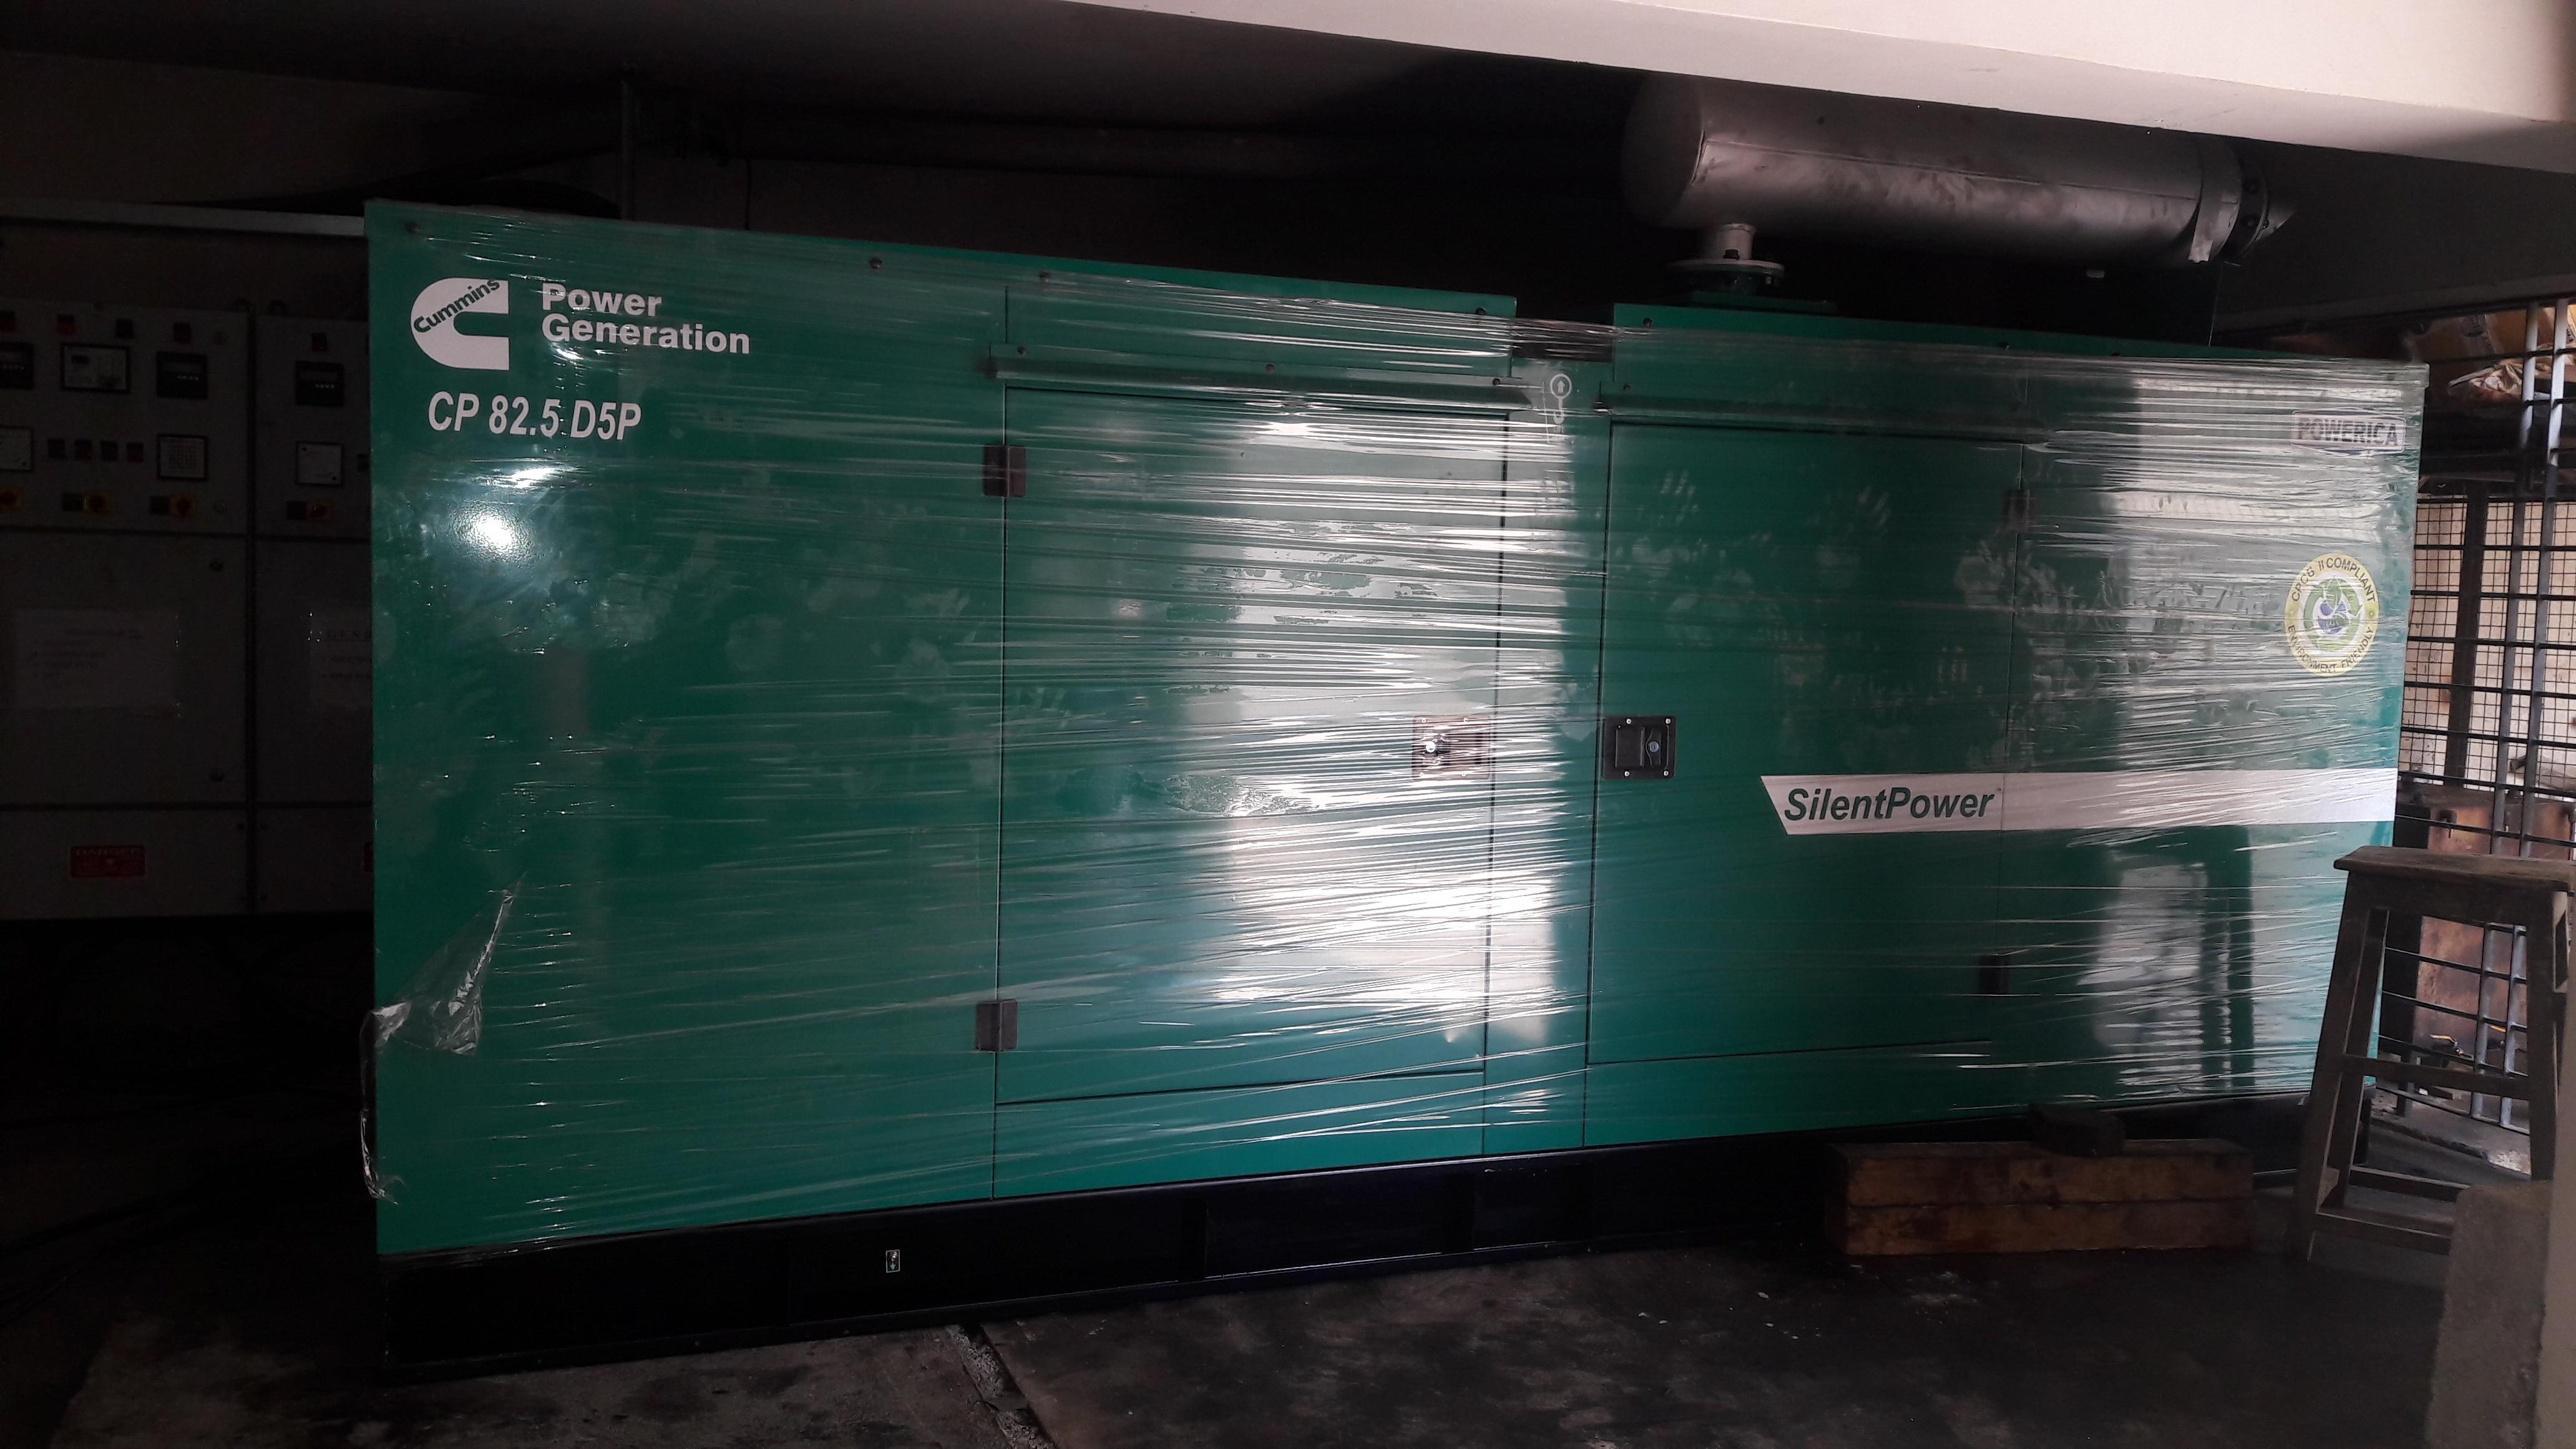 Supply erection an commissioning with Auto panel at Nagavara B'lore - 82.5kva Cummins DG set